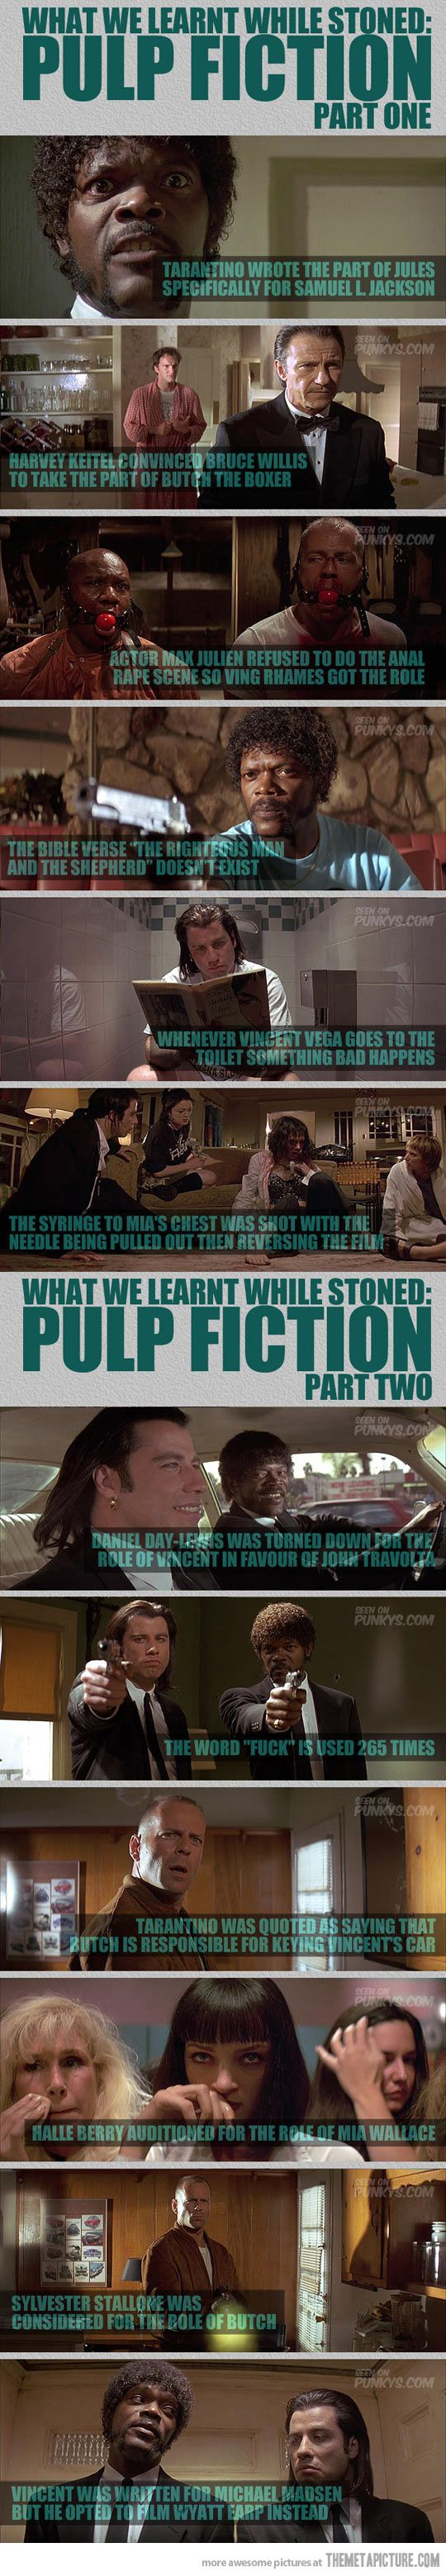 Pulp Fiction - Facts